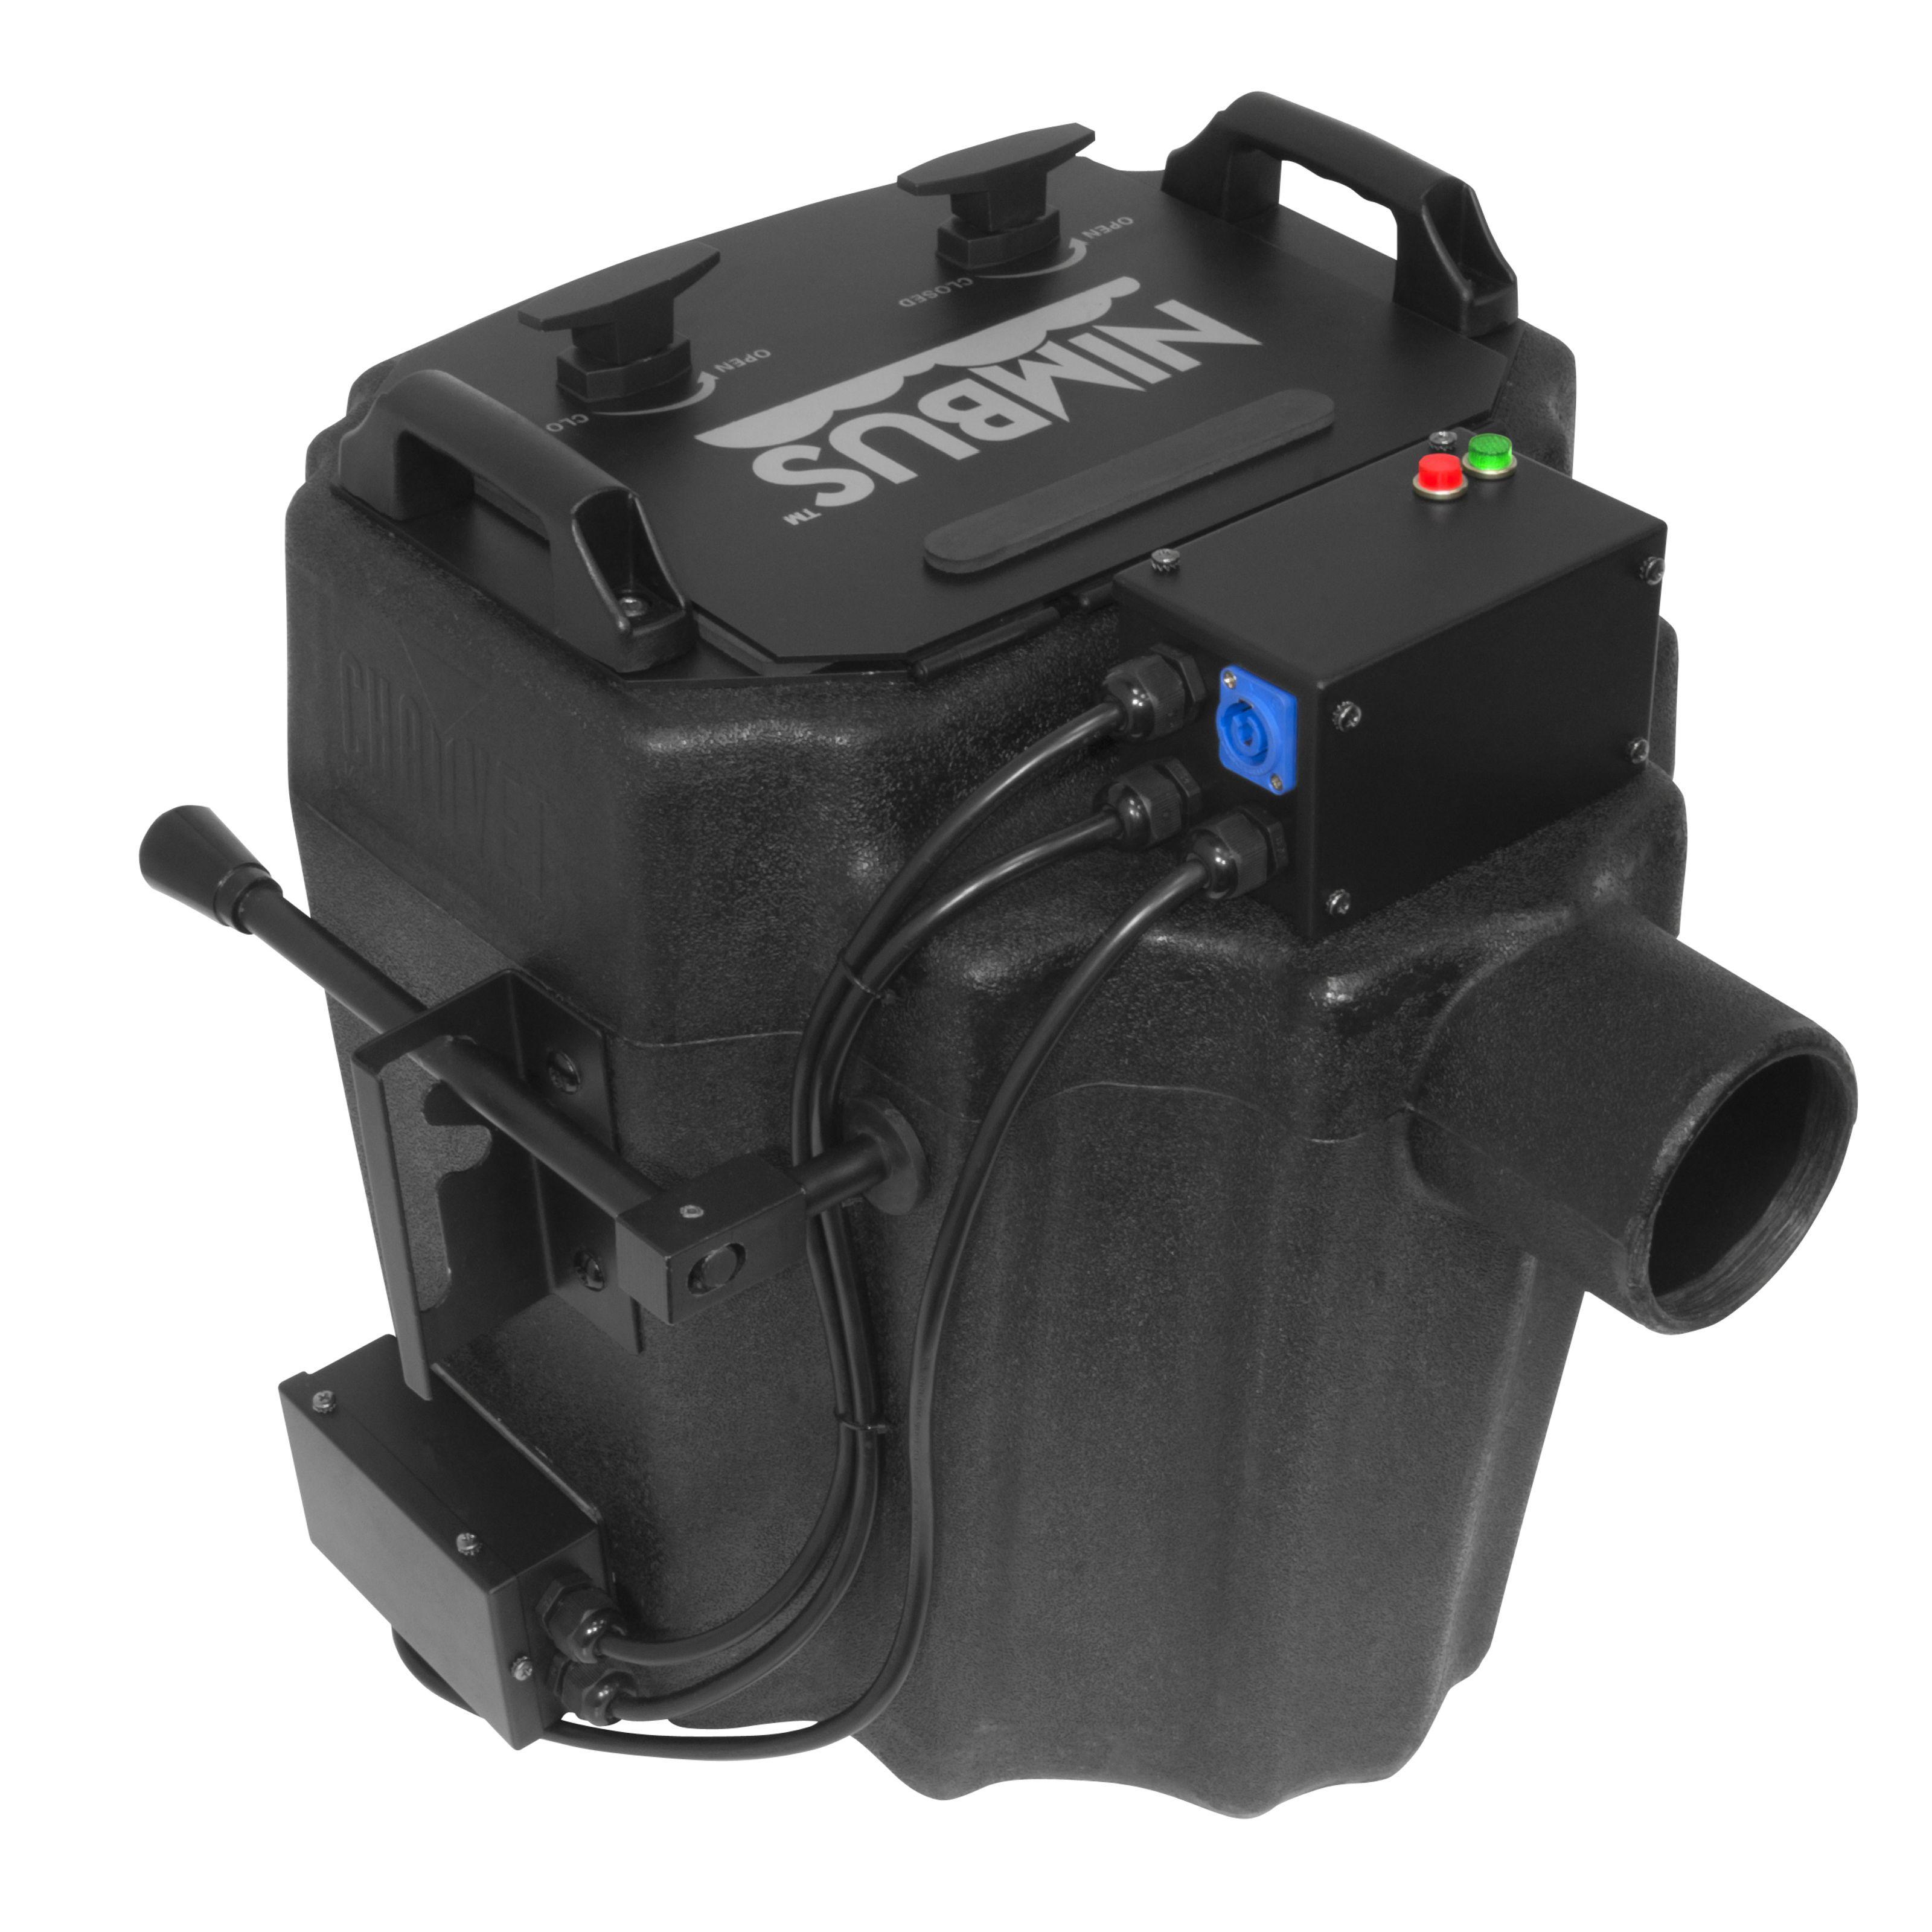 Chauvet DJ Nimbus Máquina de humo de suelo Máquina de hielo seco, 4,5 Kg